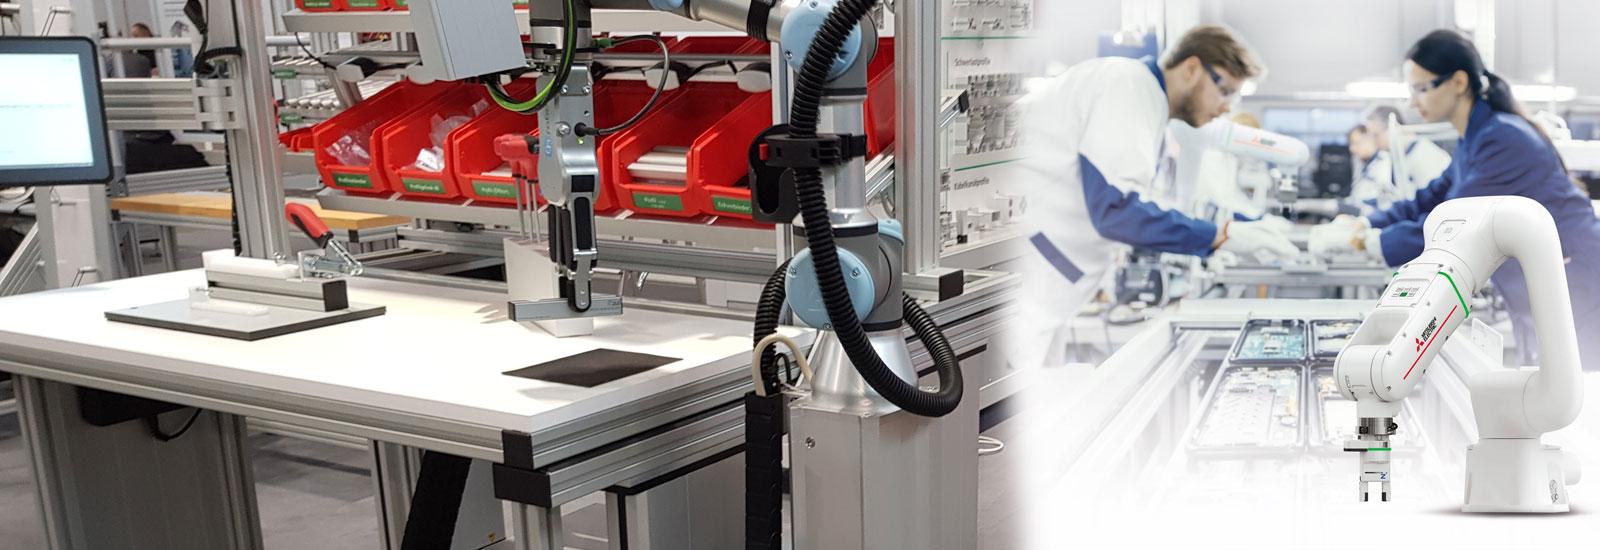 Cobots provide support at manual workstations